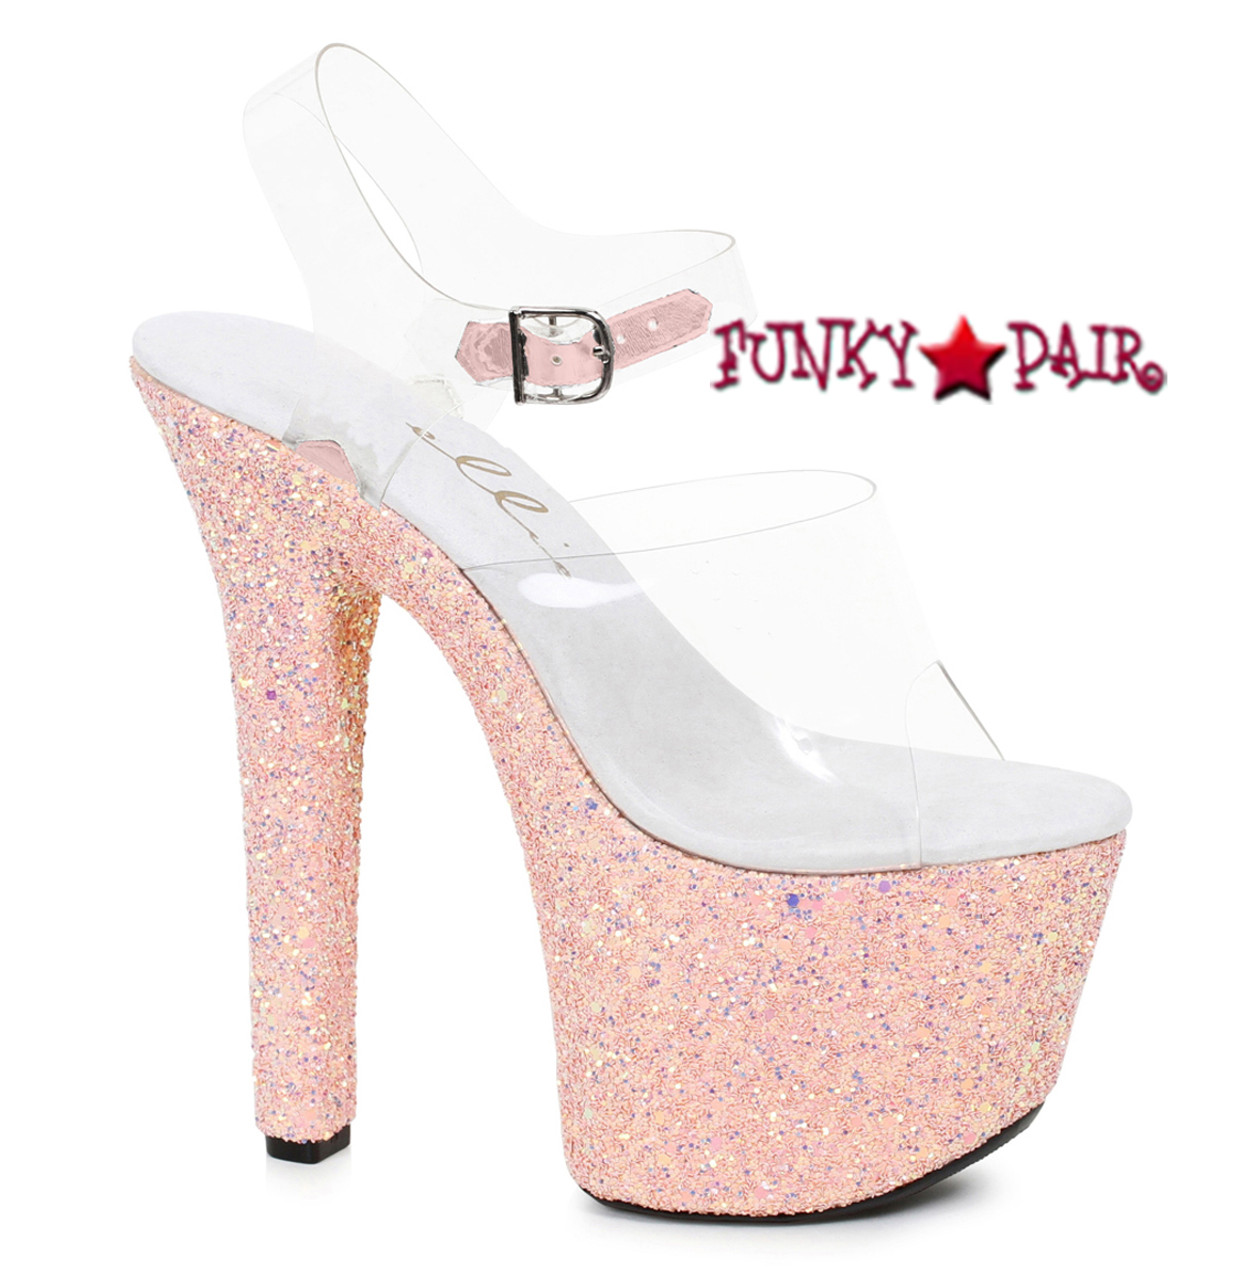 Ellie Shoes 711-SOLAR 7 Inch Heel Neon Platform Blacklight Reactive Spikes